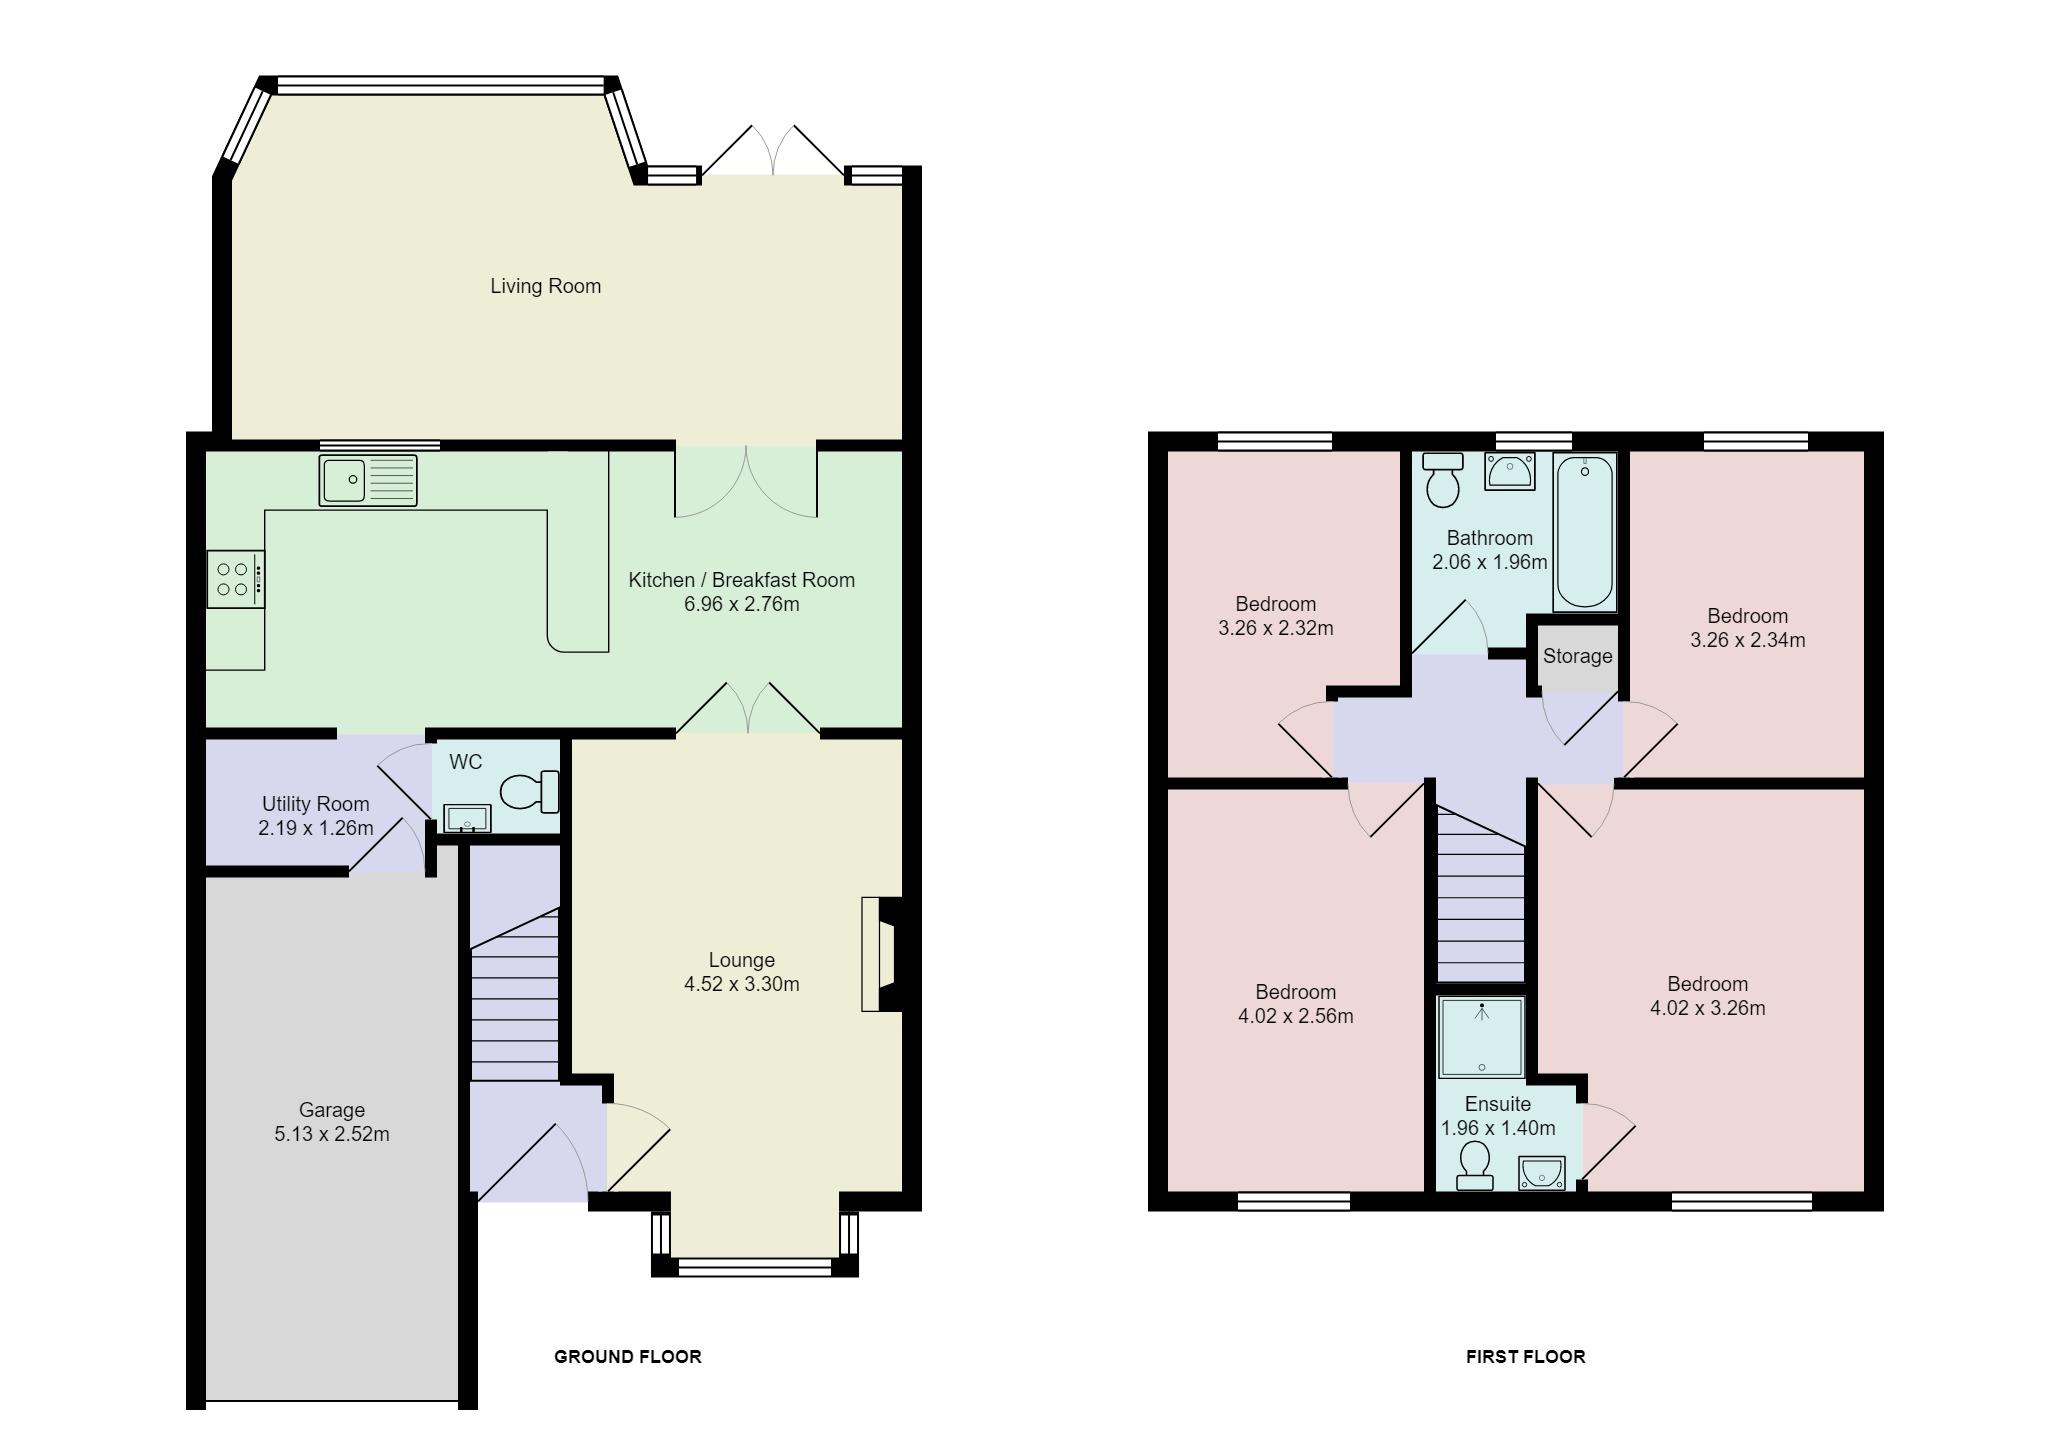 Residential House Floor Plans Cheap Floor Plans Only 40